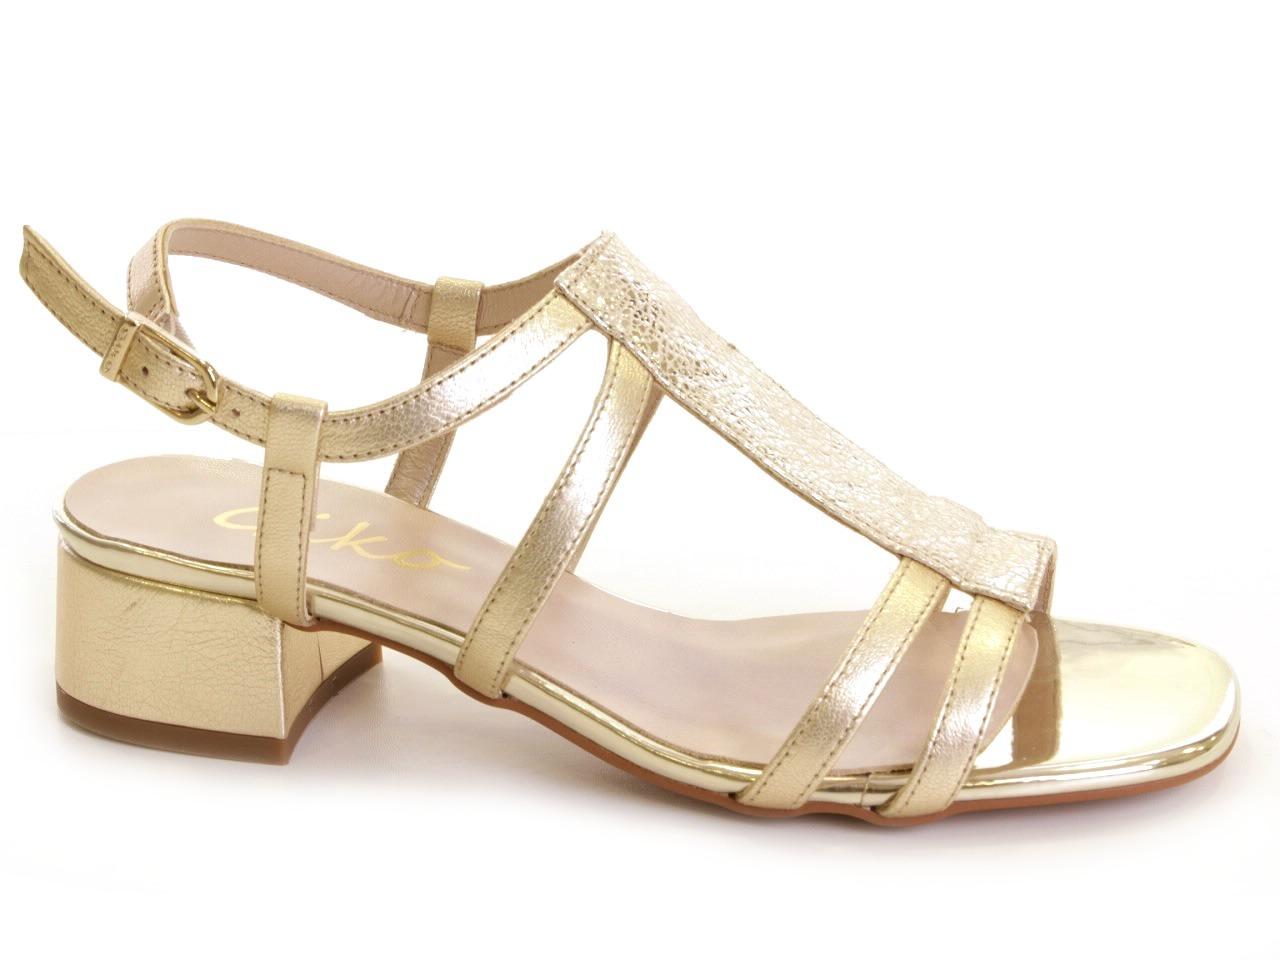 Sandales Plates Giko - 476 13999